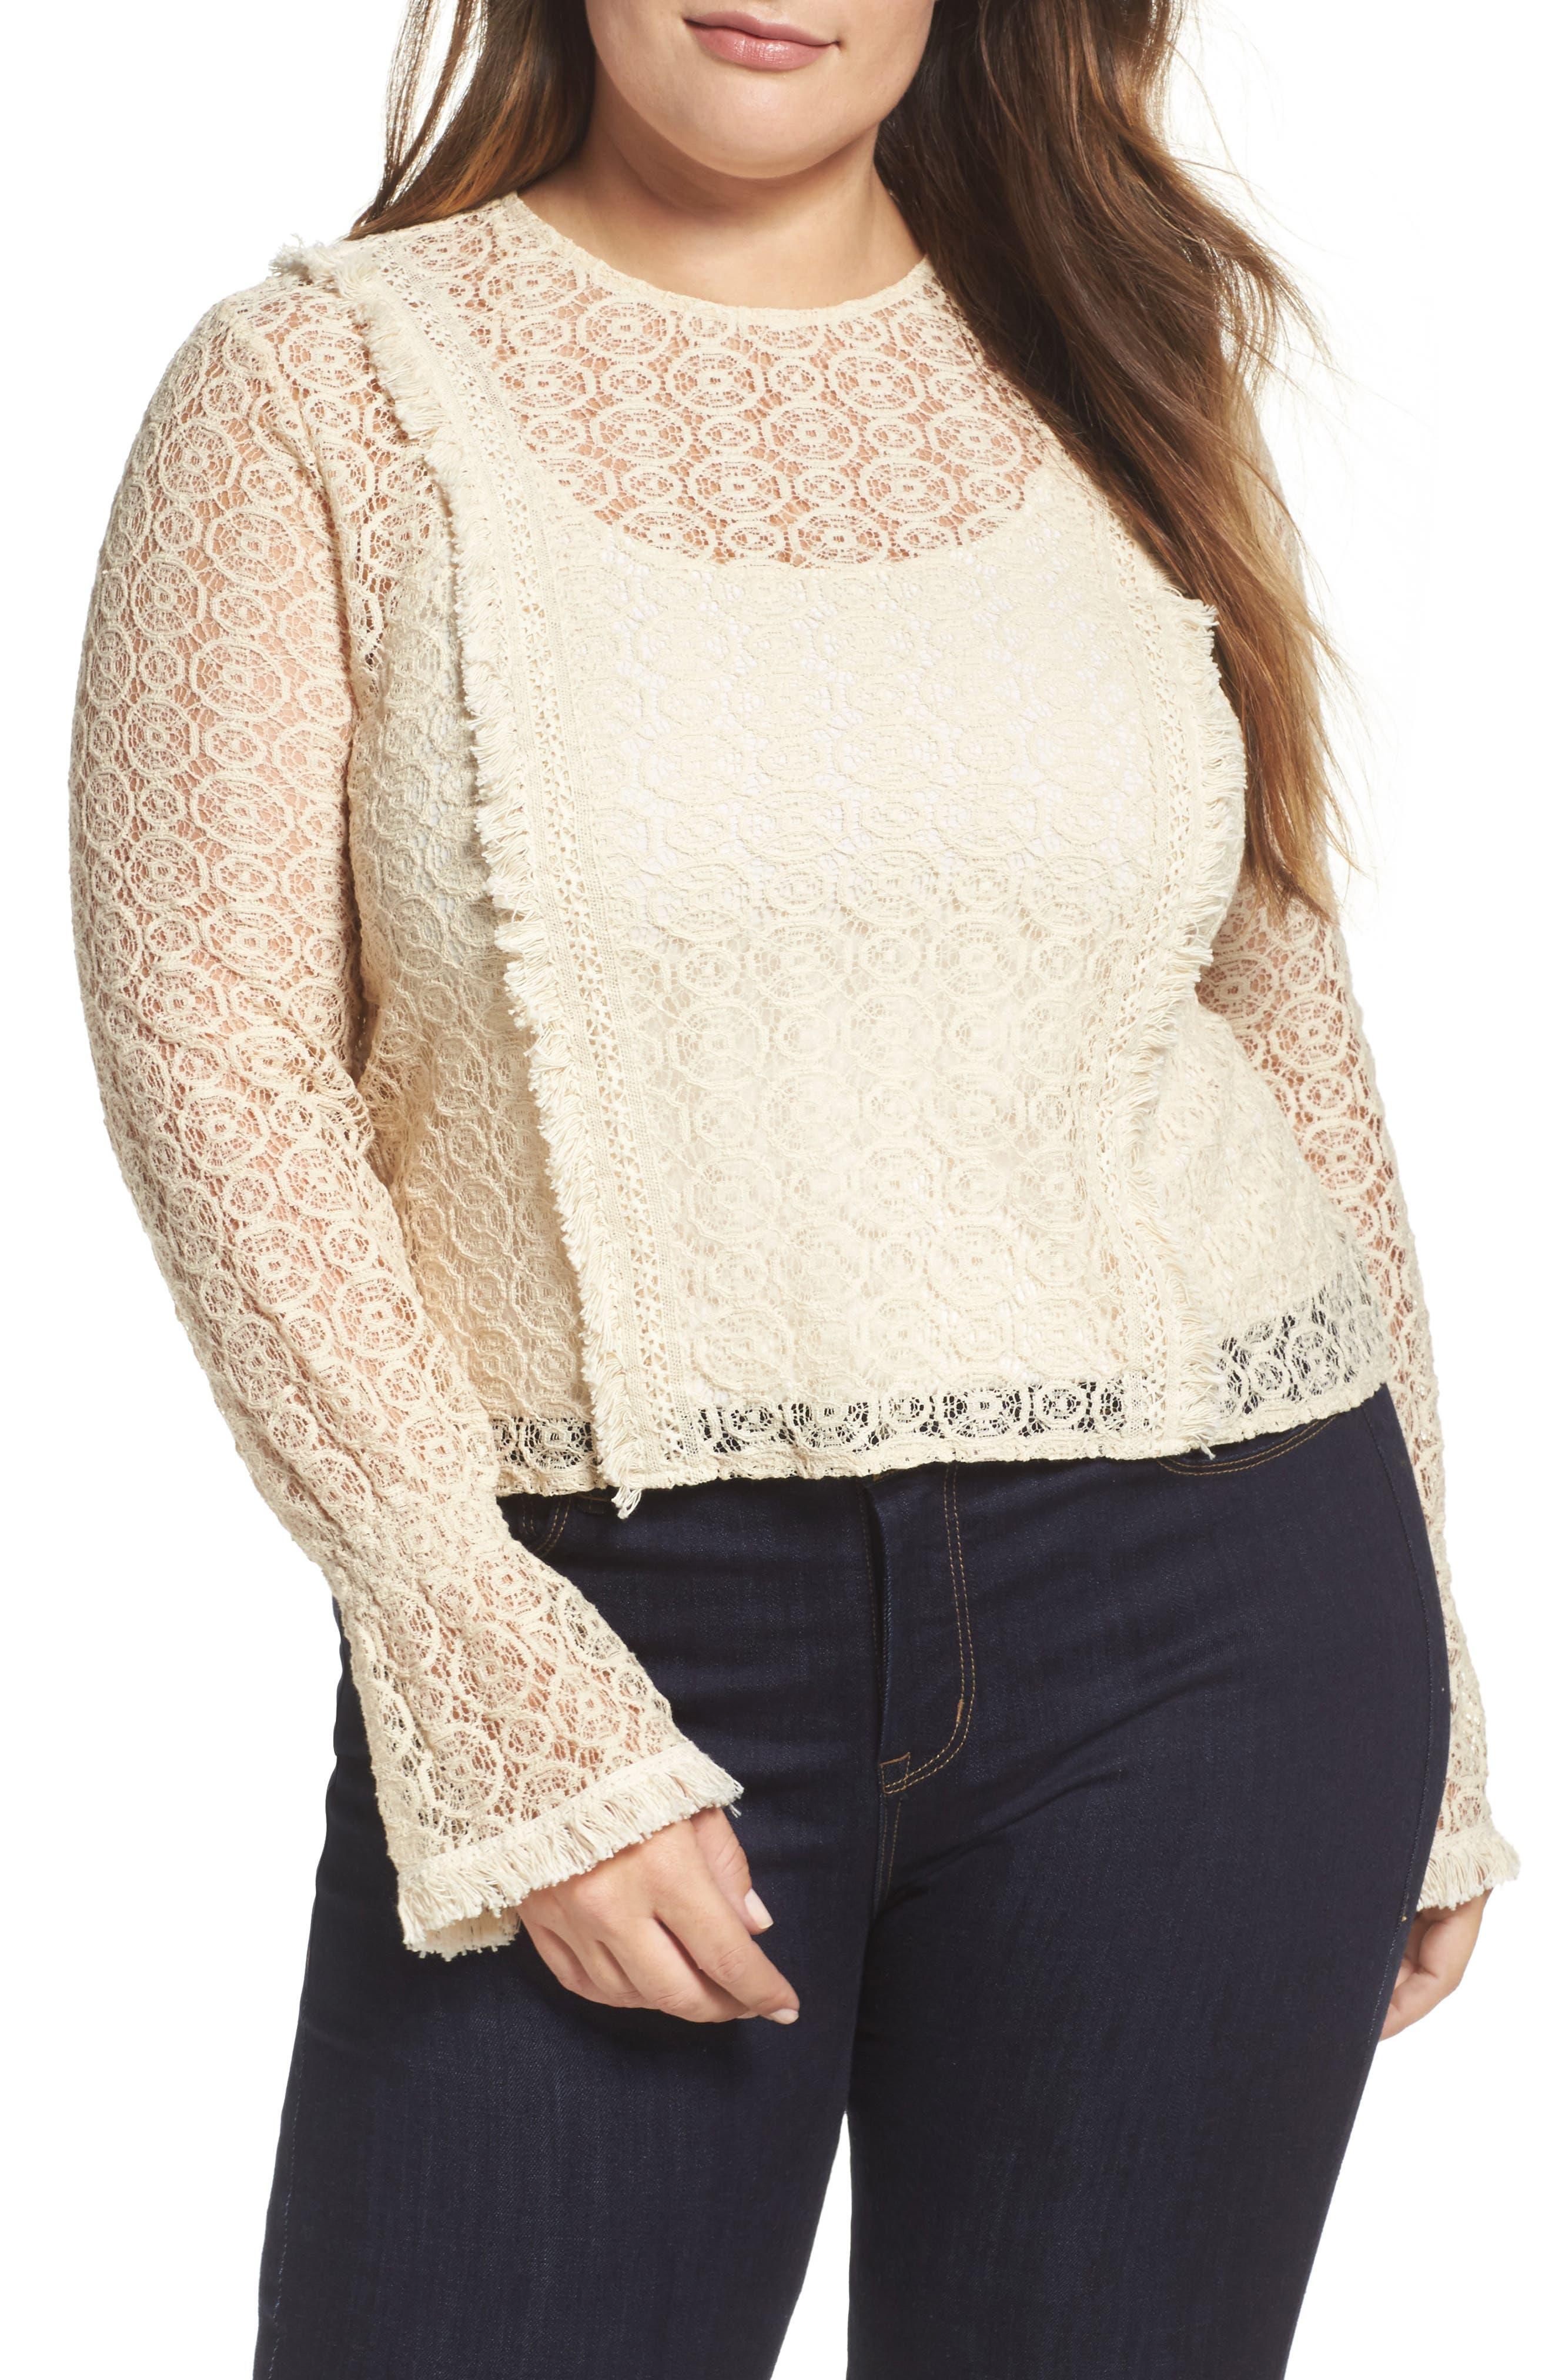 Main Image - ELVI Fringe Trim Lace Top (Plus Size)